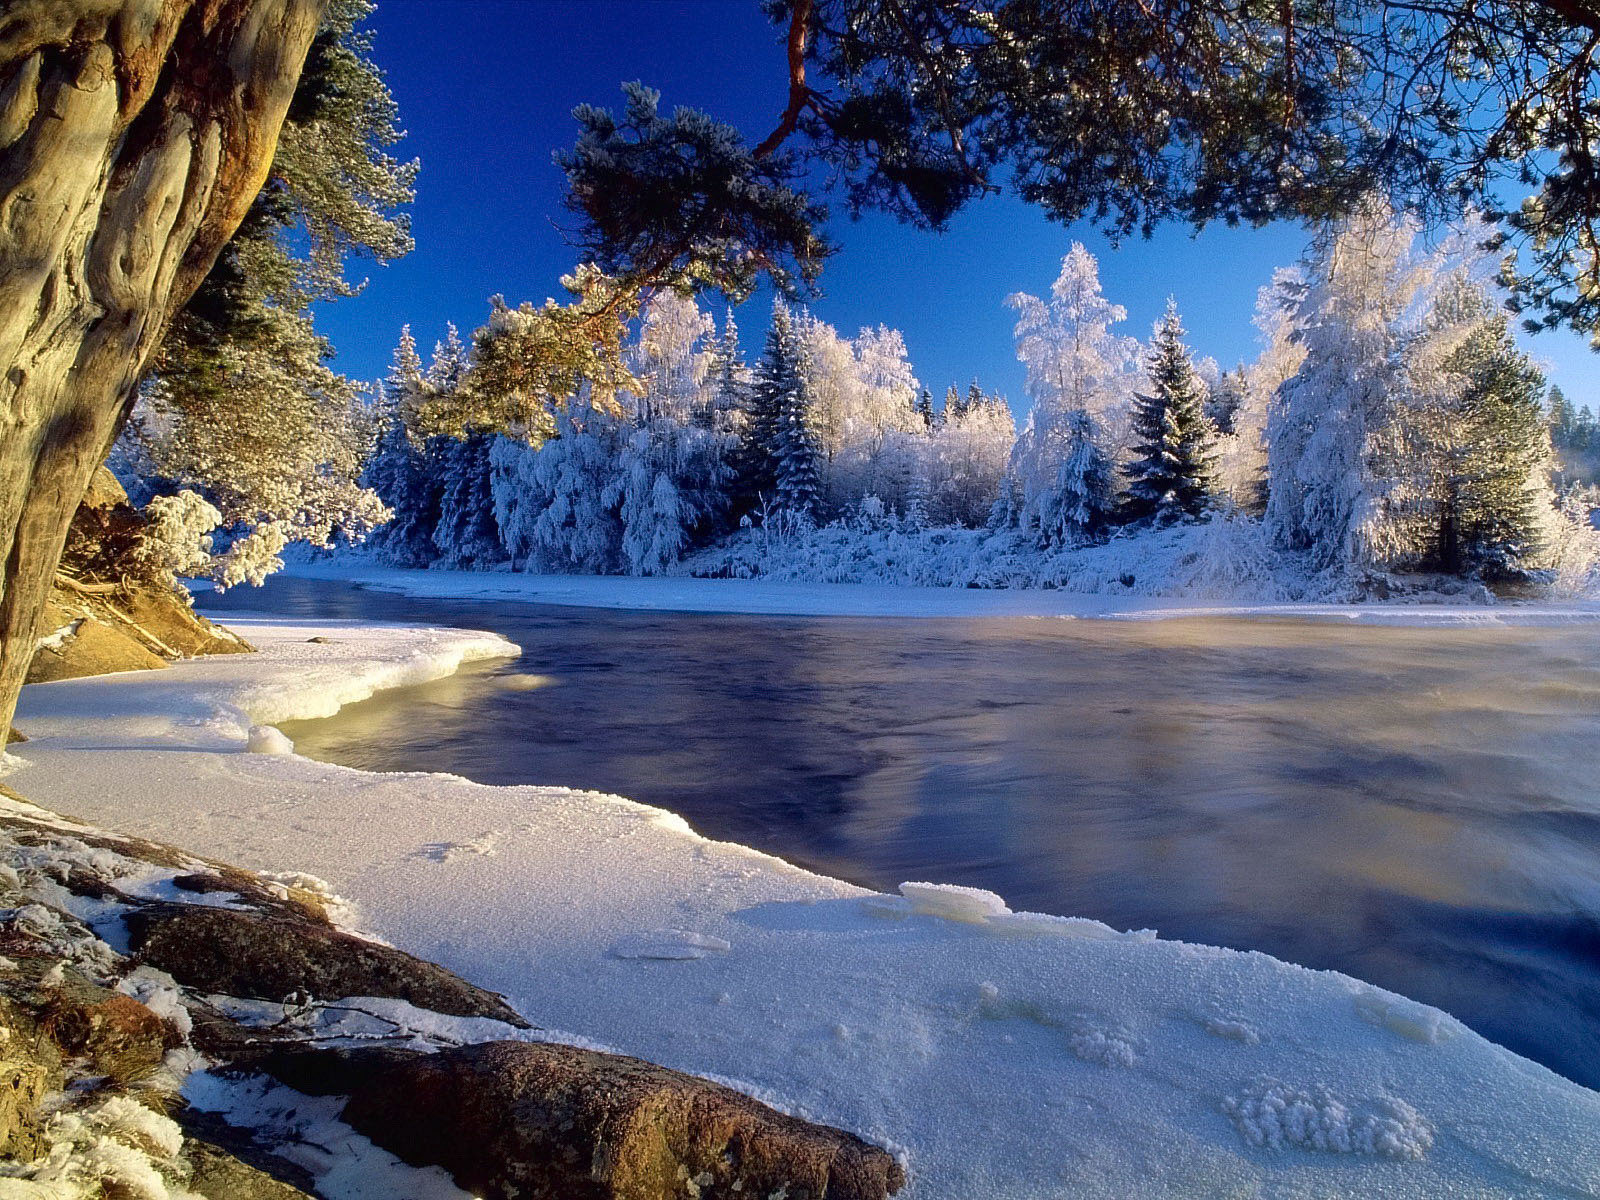 Beautiful Hd Winter Wallpapers - Best Pics Ever Nature - HD Wallpaper